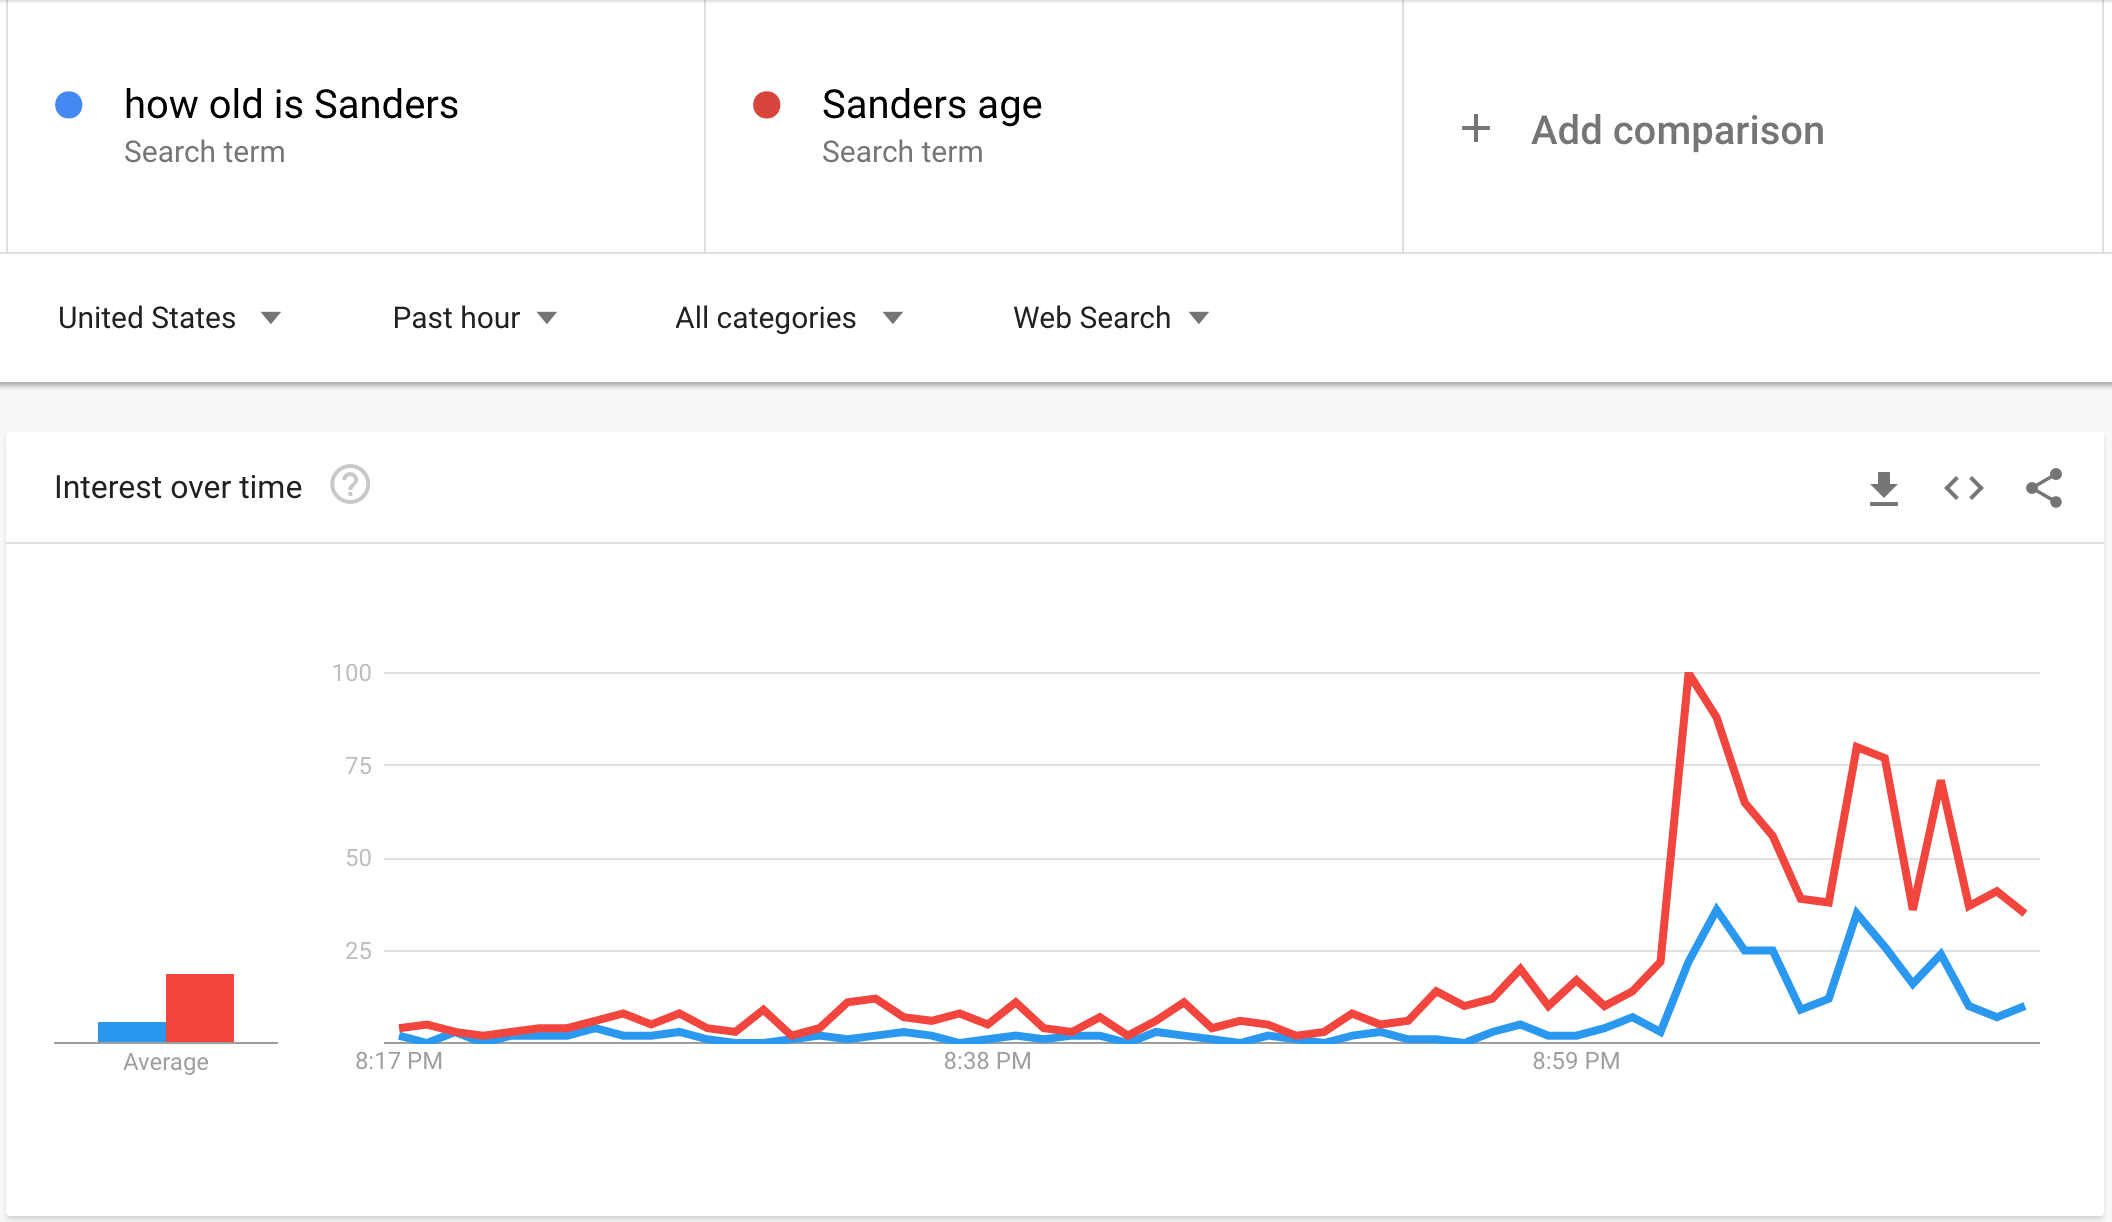 sanders age screenshot. google